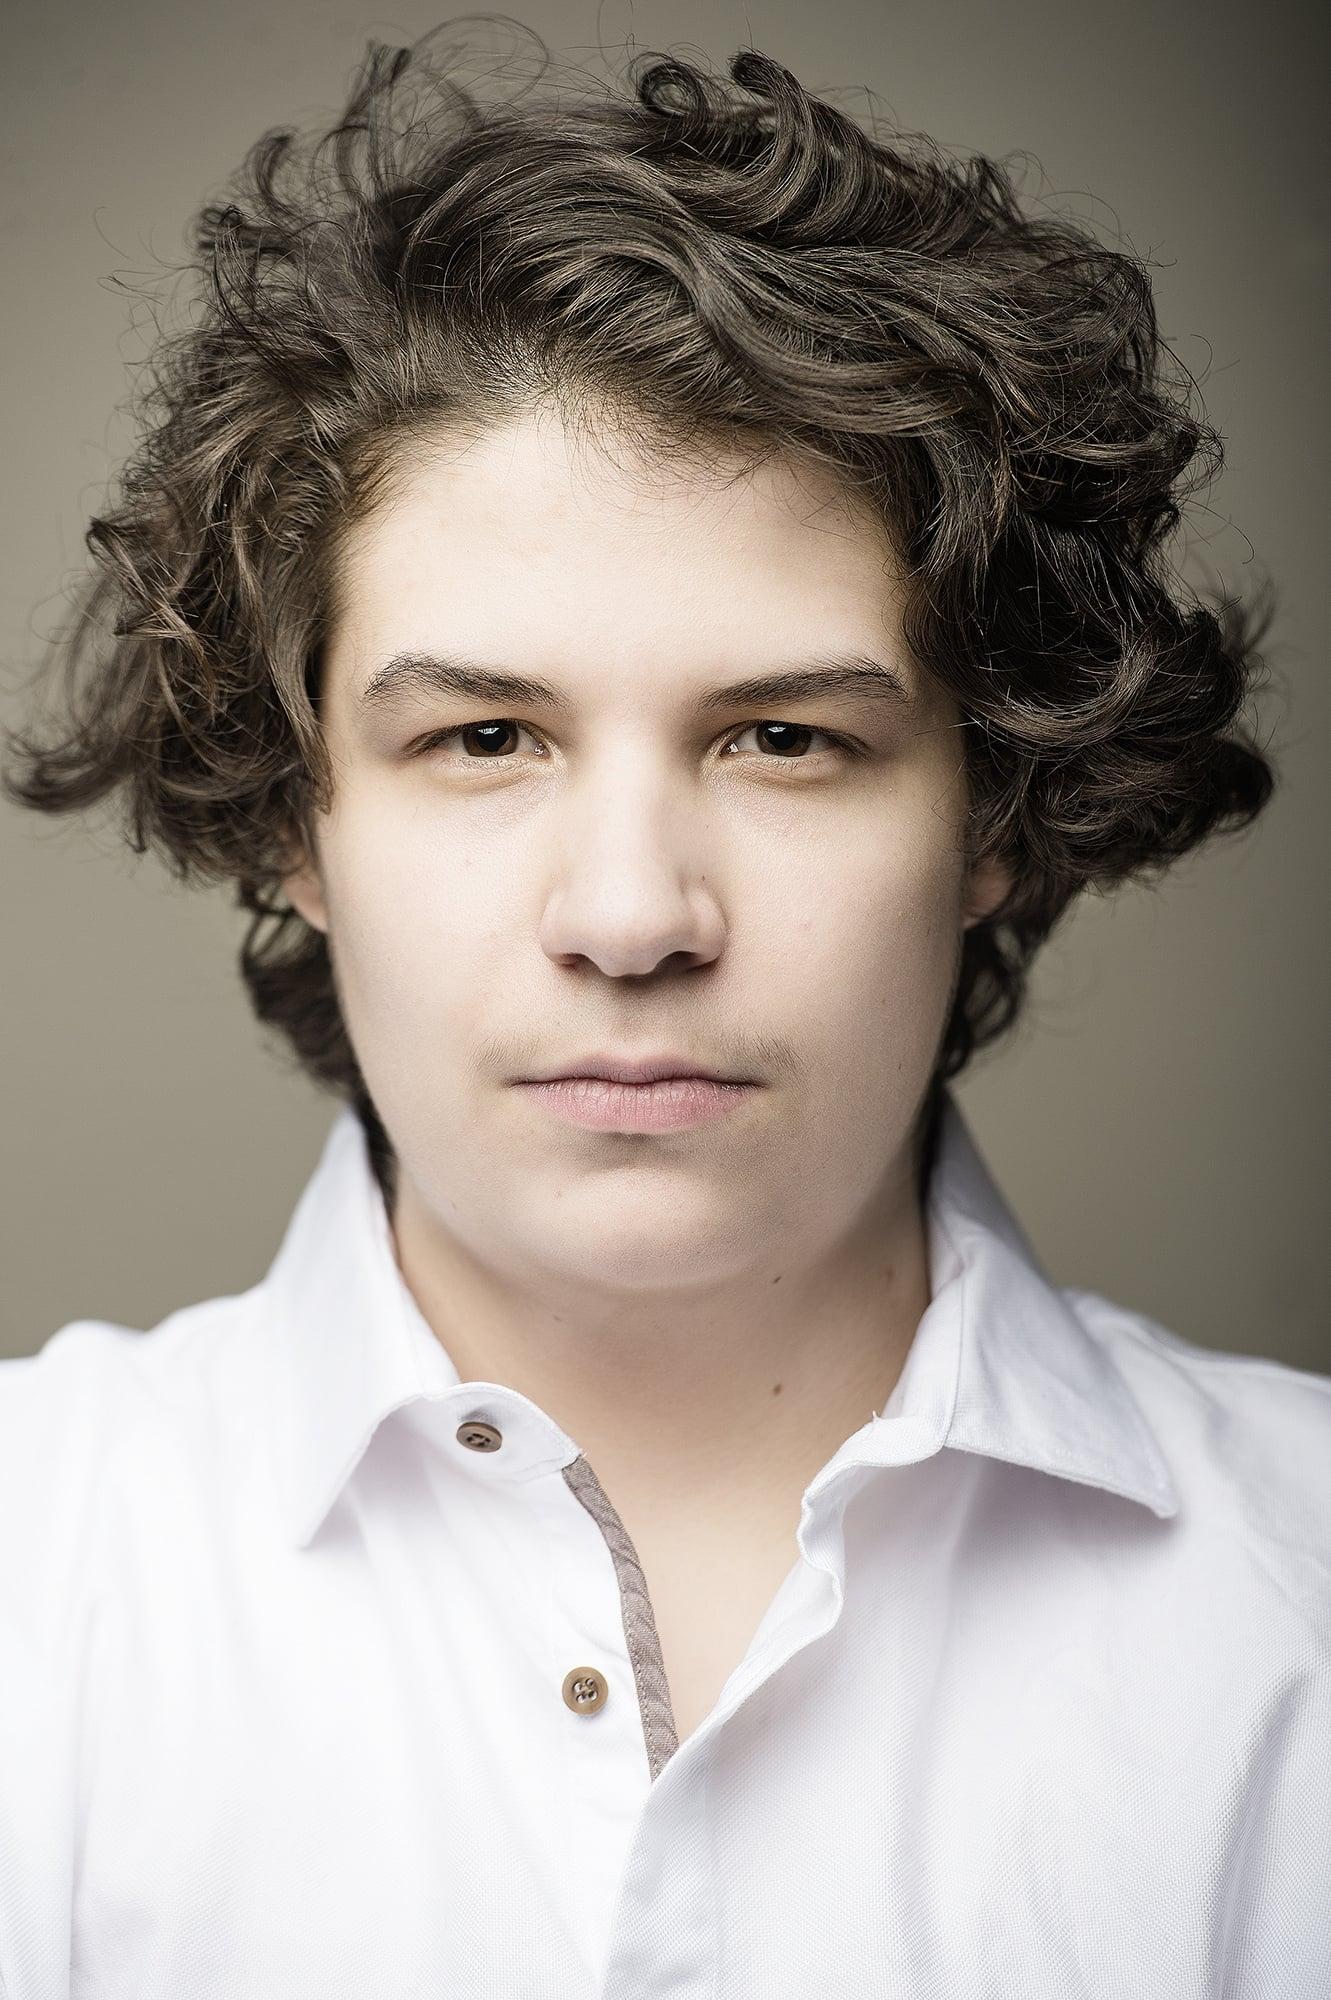 Cem Lukas Yeginer